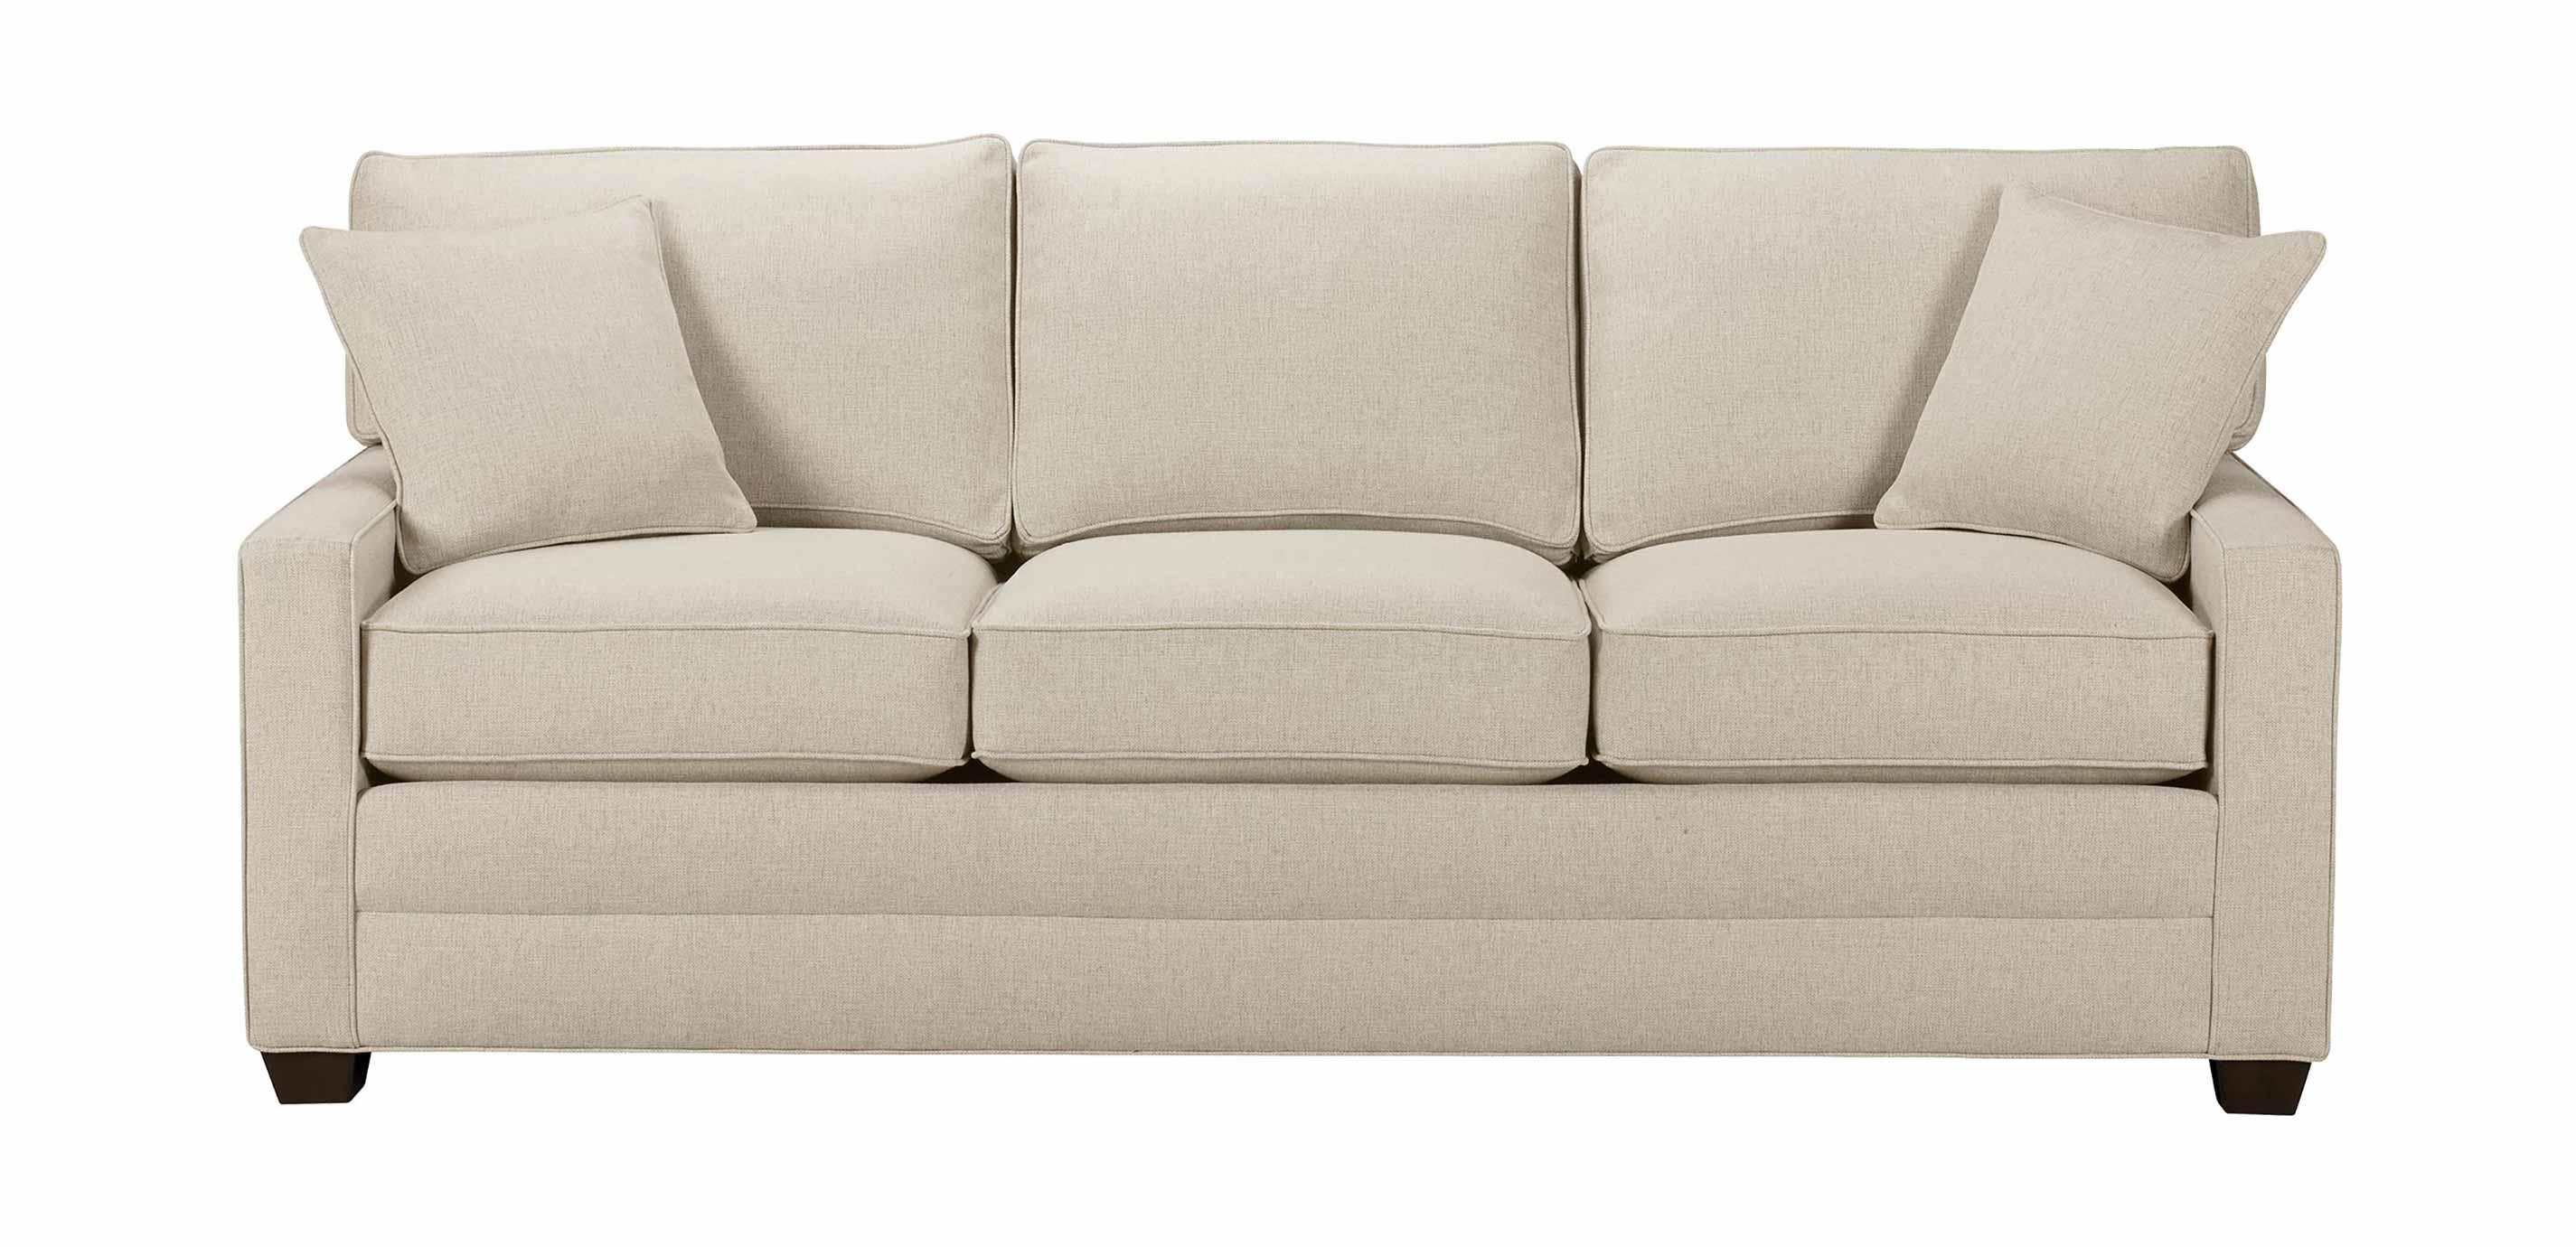 track arm sofa divani casa polaris mini contemporary bonded leather sectional bennett sofas quick ship and loveseats